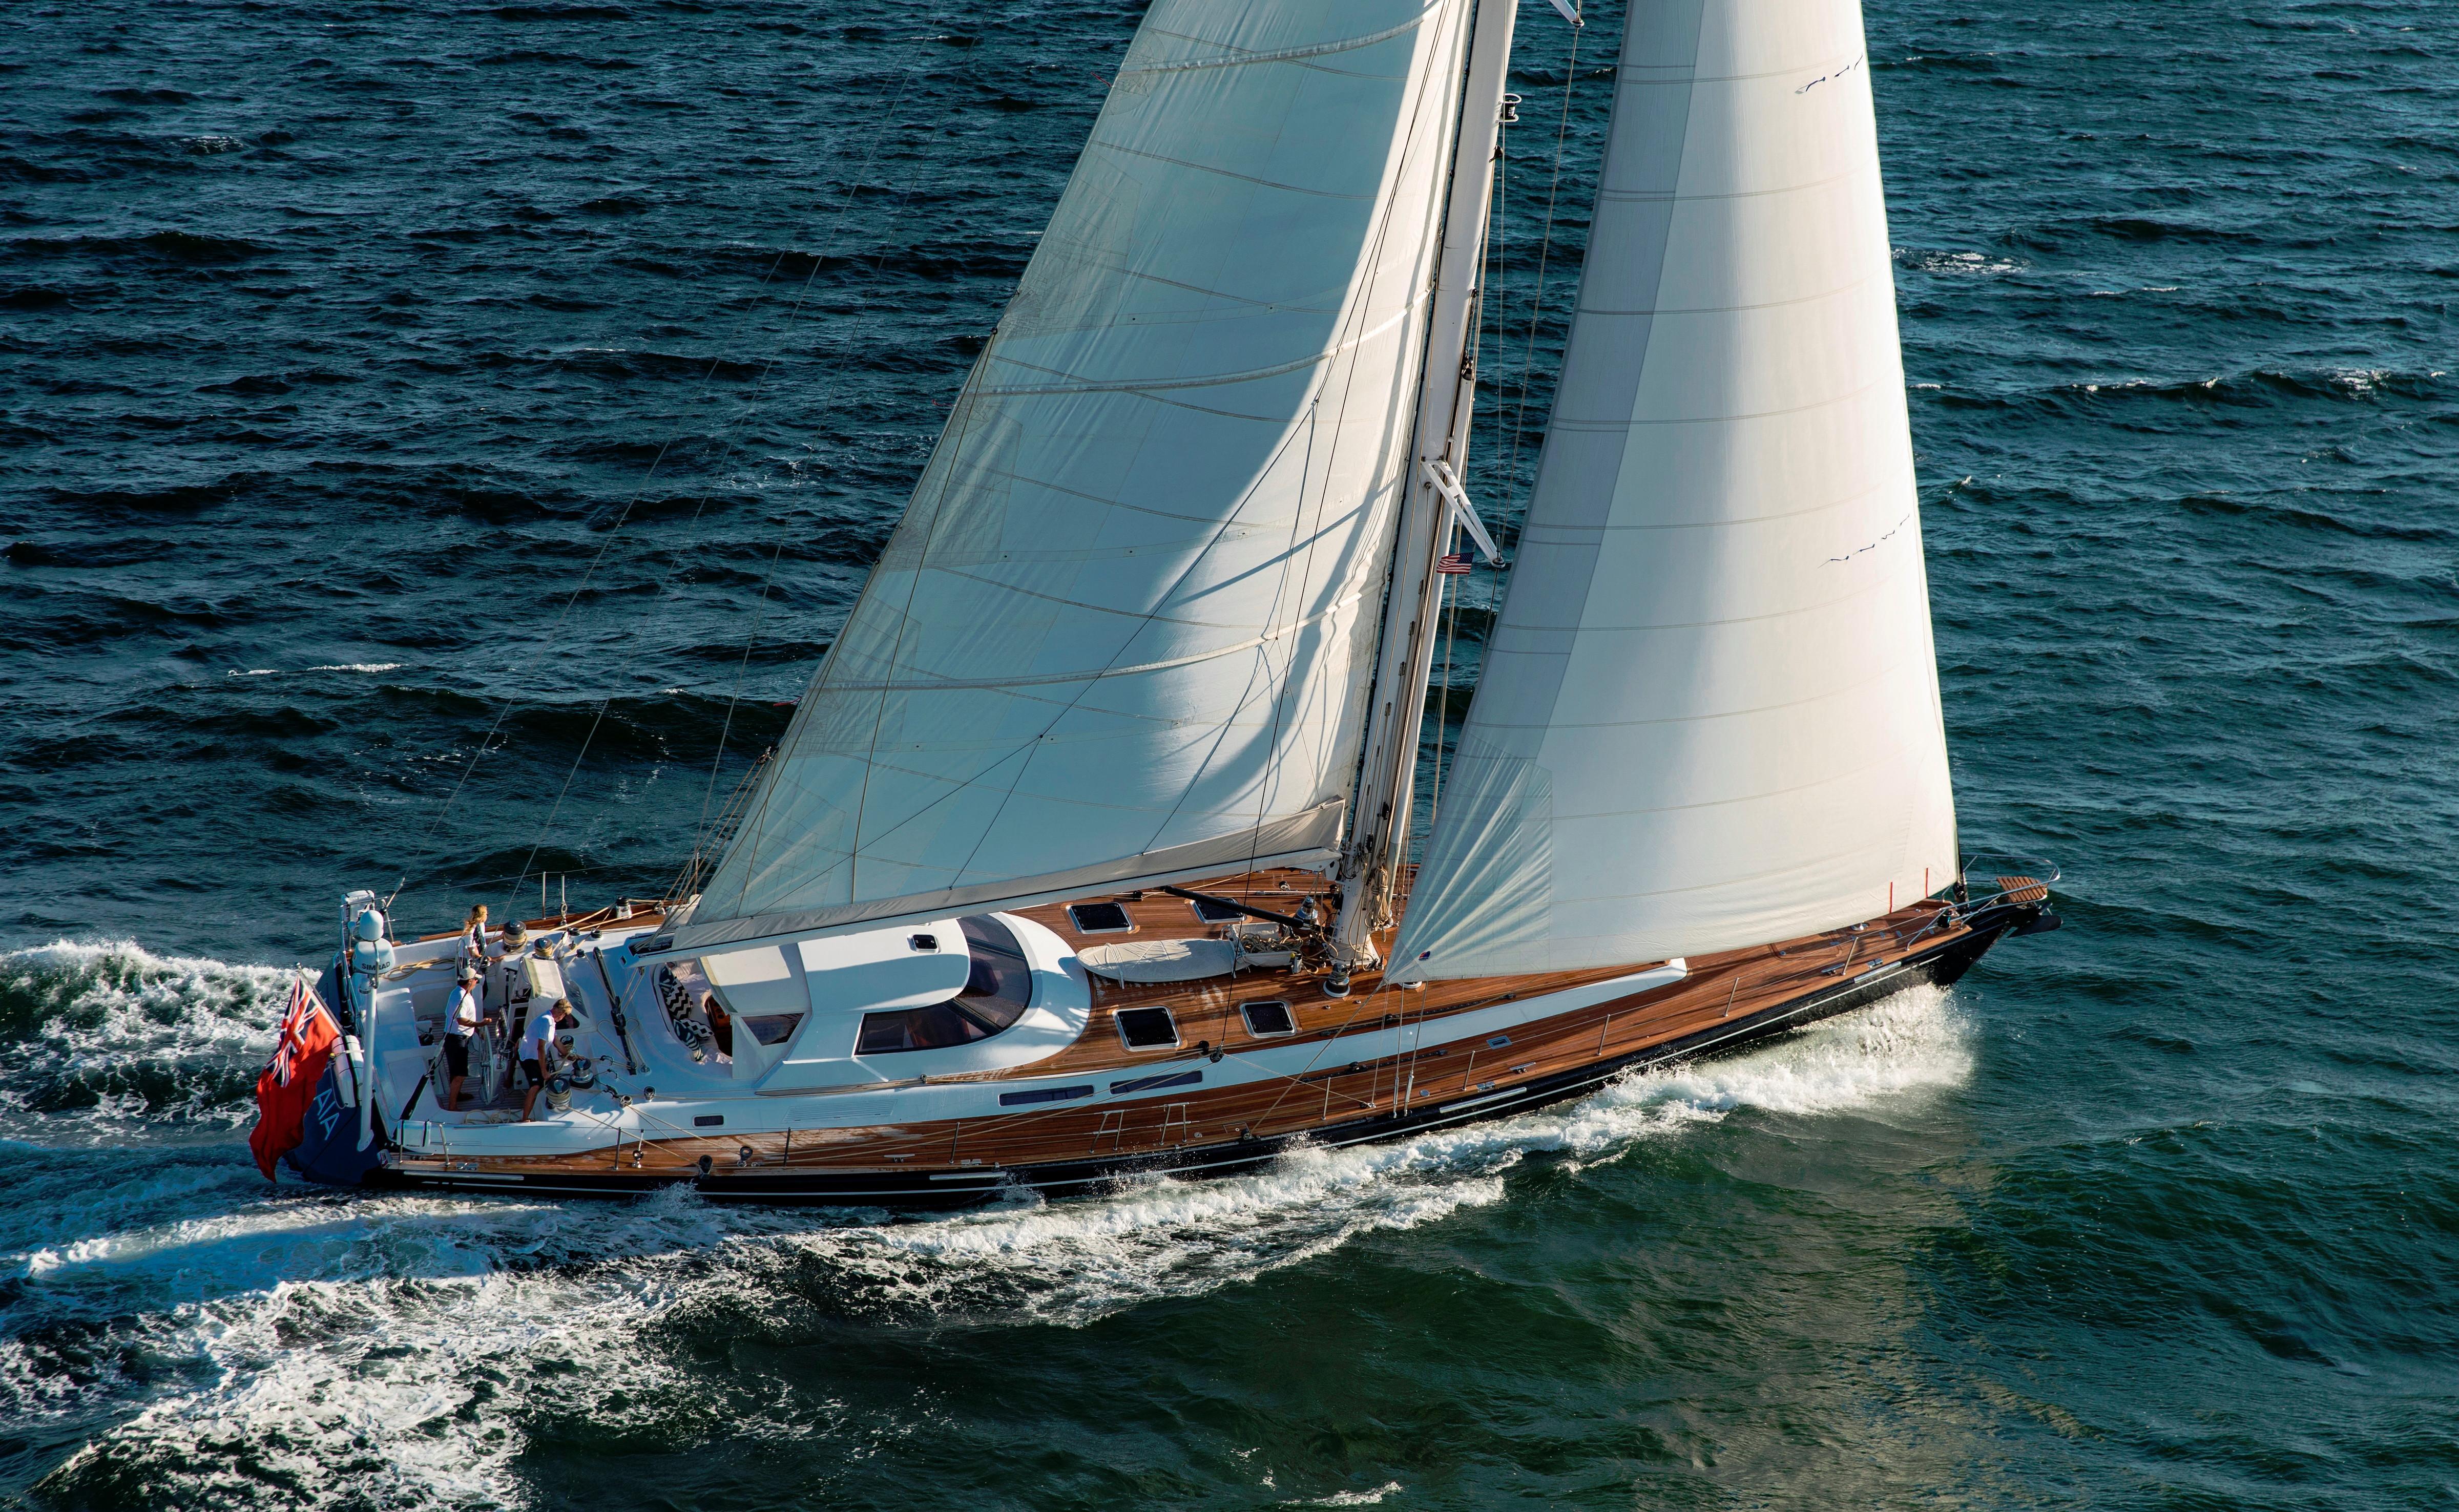 HYS Yachts Phoenix 77 design by Humphreys